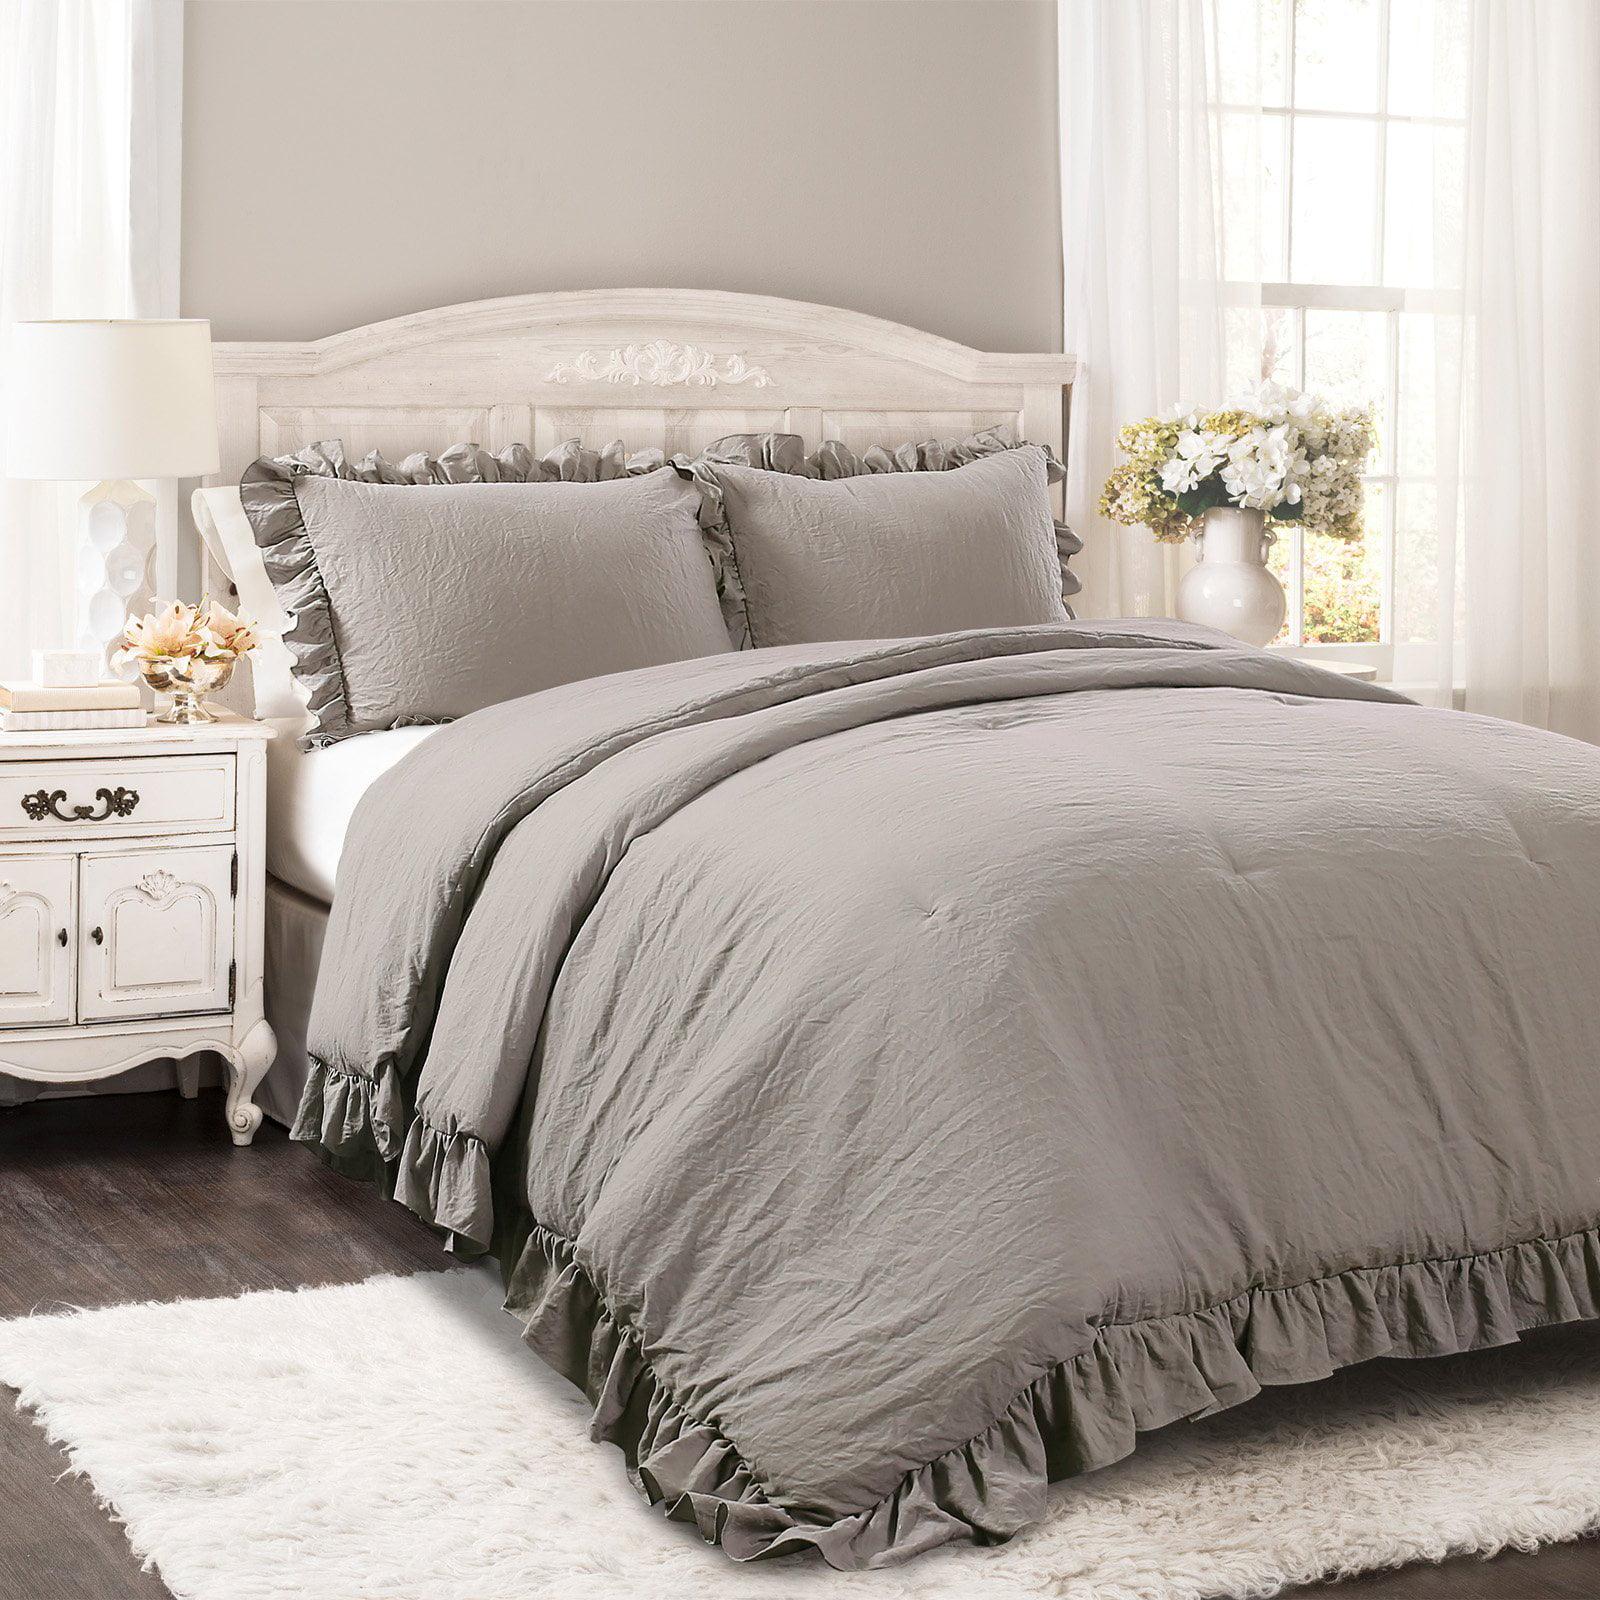 """Lush Decor Reyna Textured Ruffle Detail Comforter, Full/Queen, Gray, 3-Pc Set"""